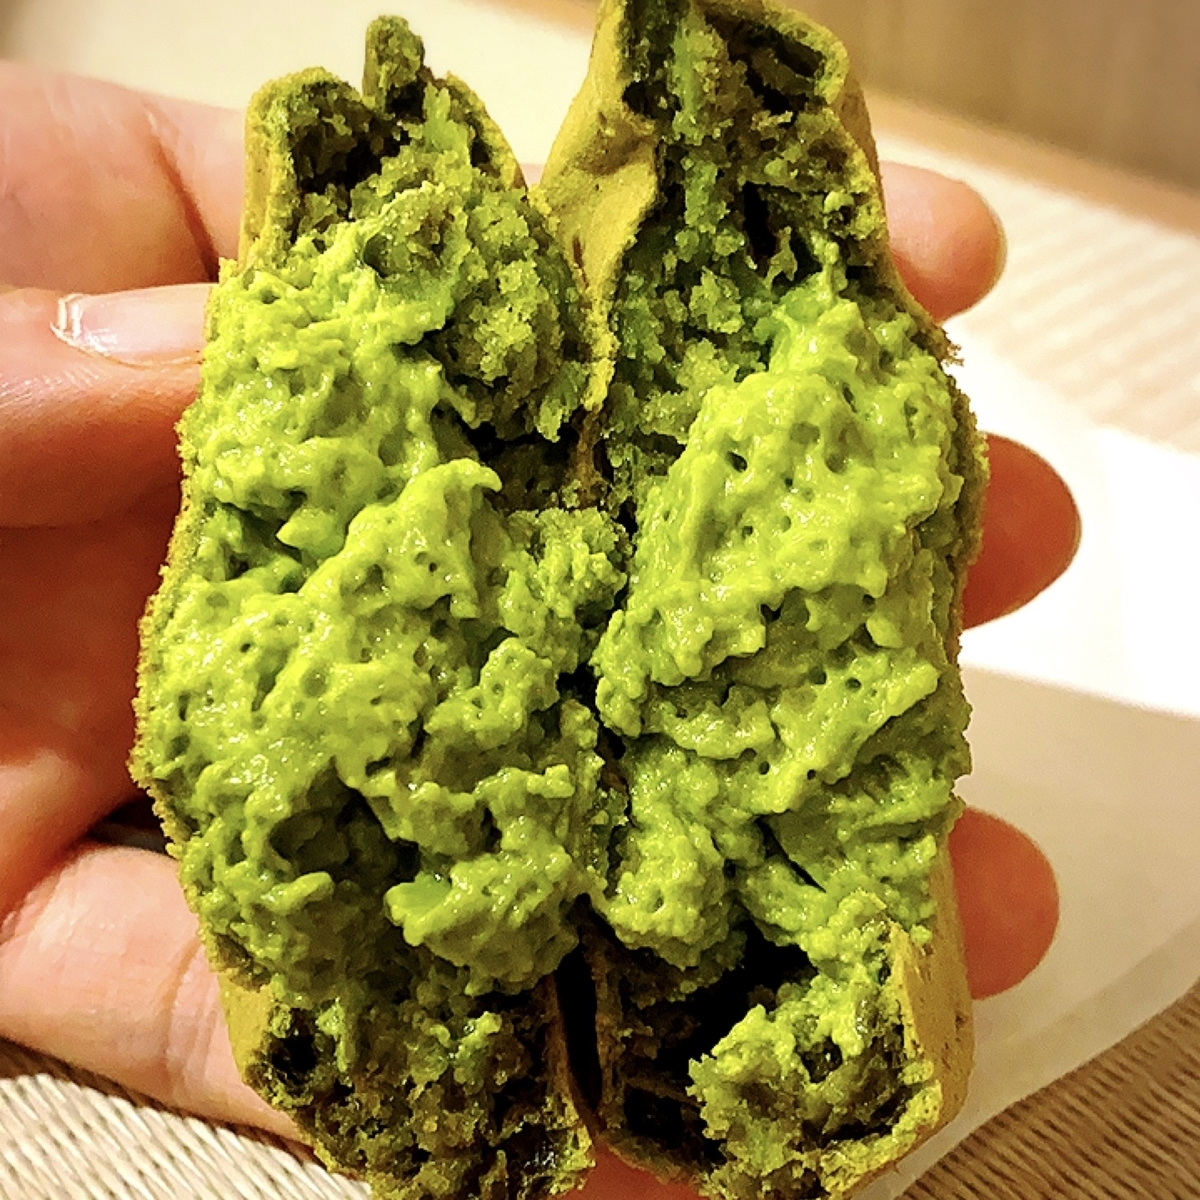 「d:matcha Kyoto」は抹茶スイーツや抹茶ギフトをお取り寄せするのにおすすめのネットショップでした